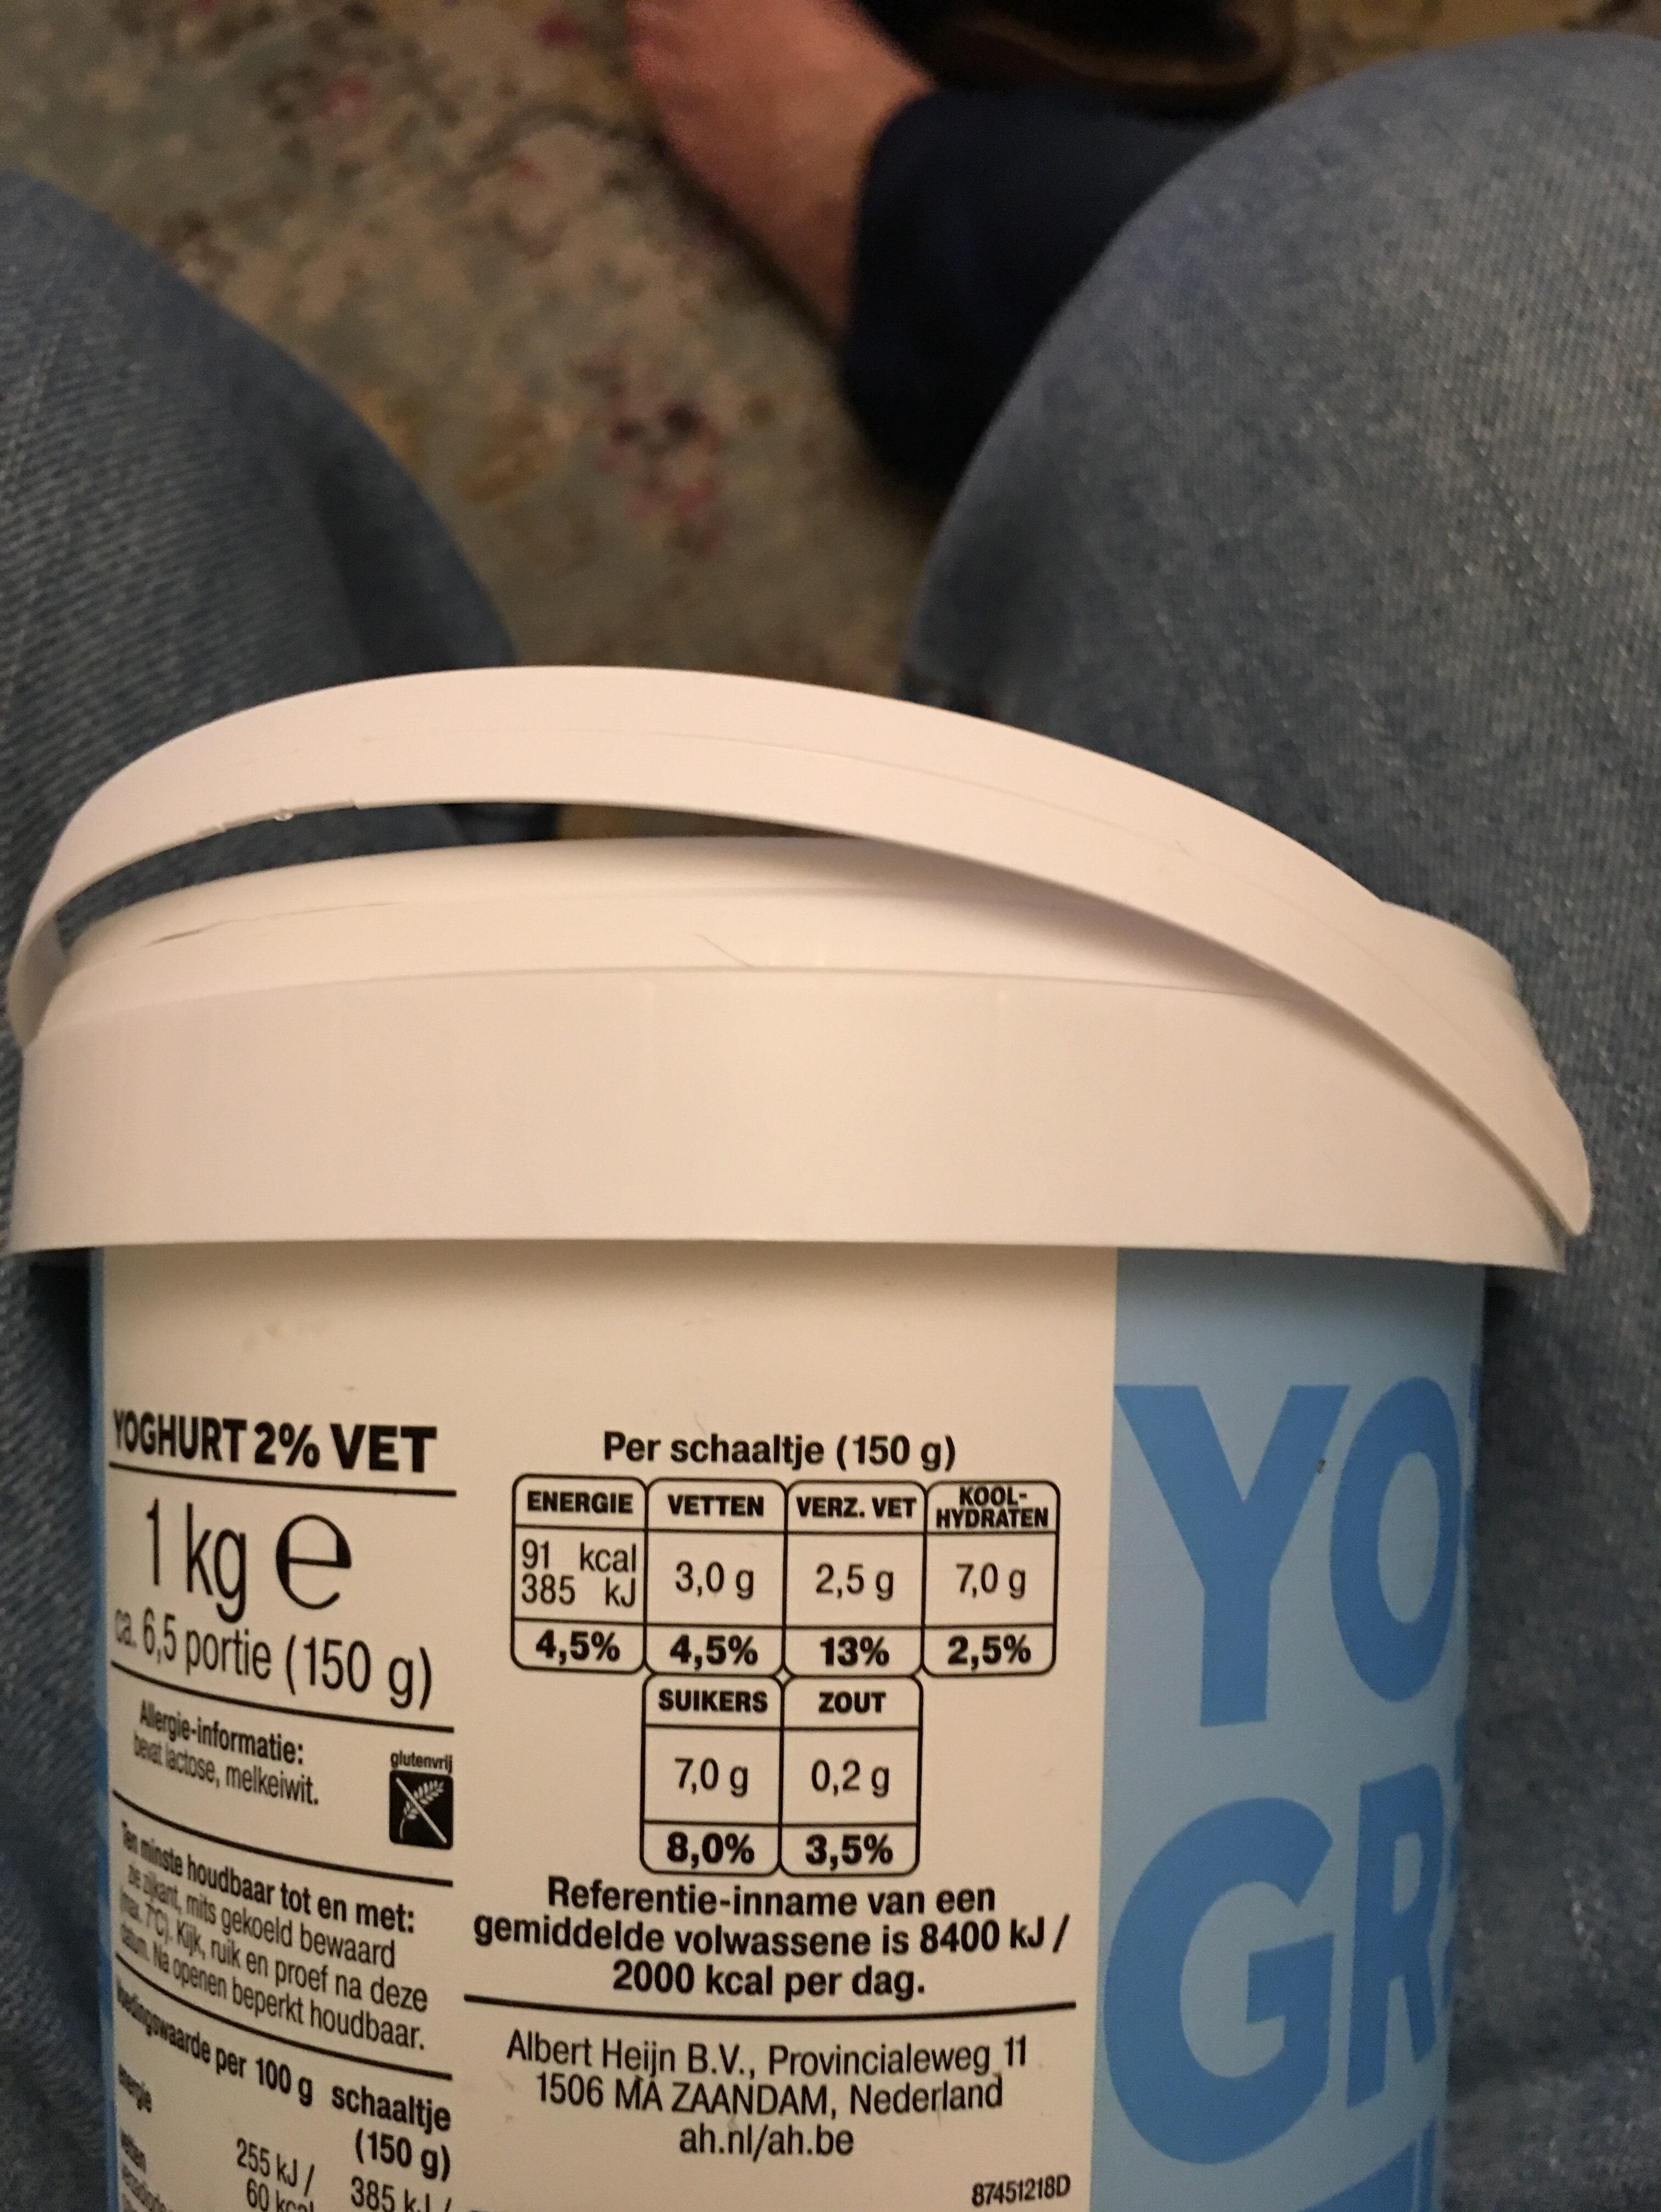 De zaanse hoeve yogurt griekse stijl 2% vet - Ingrediënten - nl